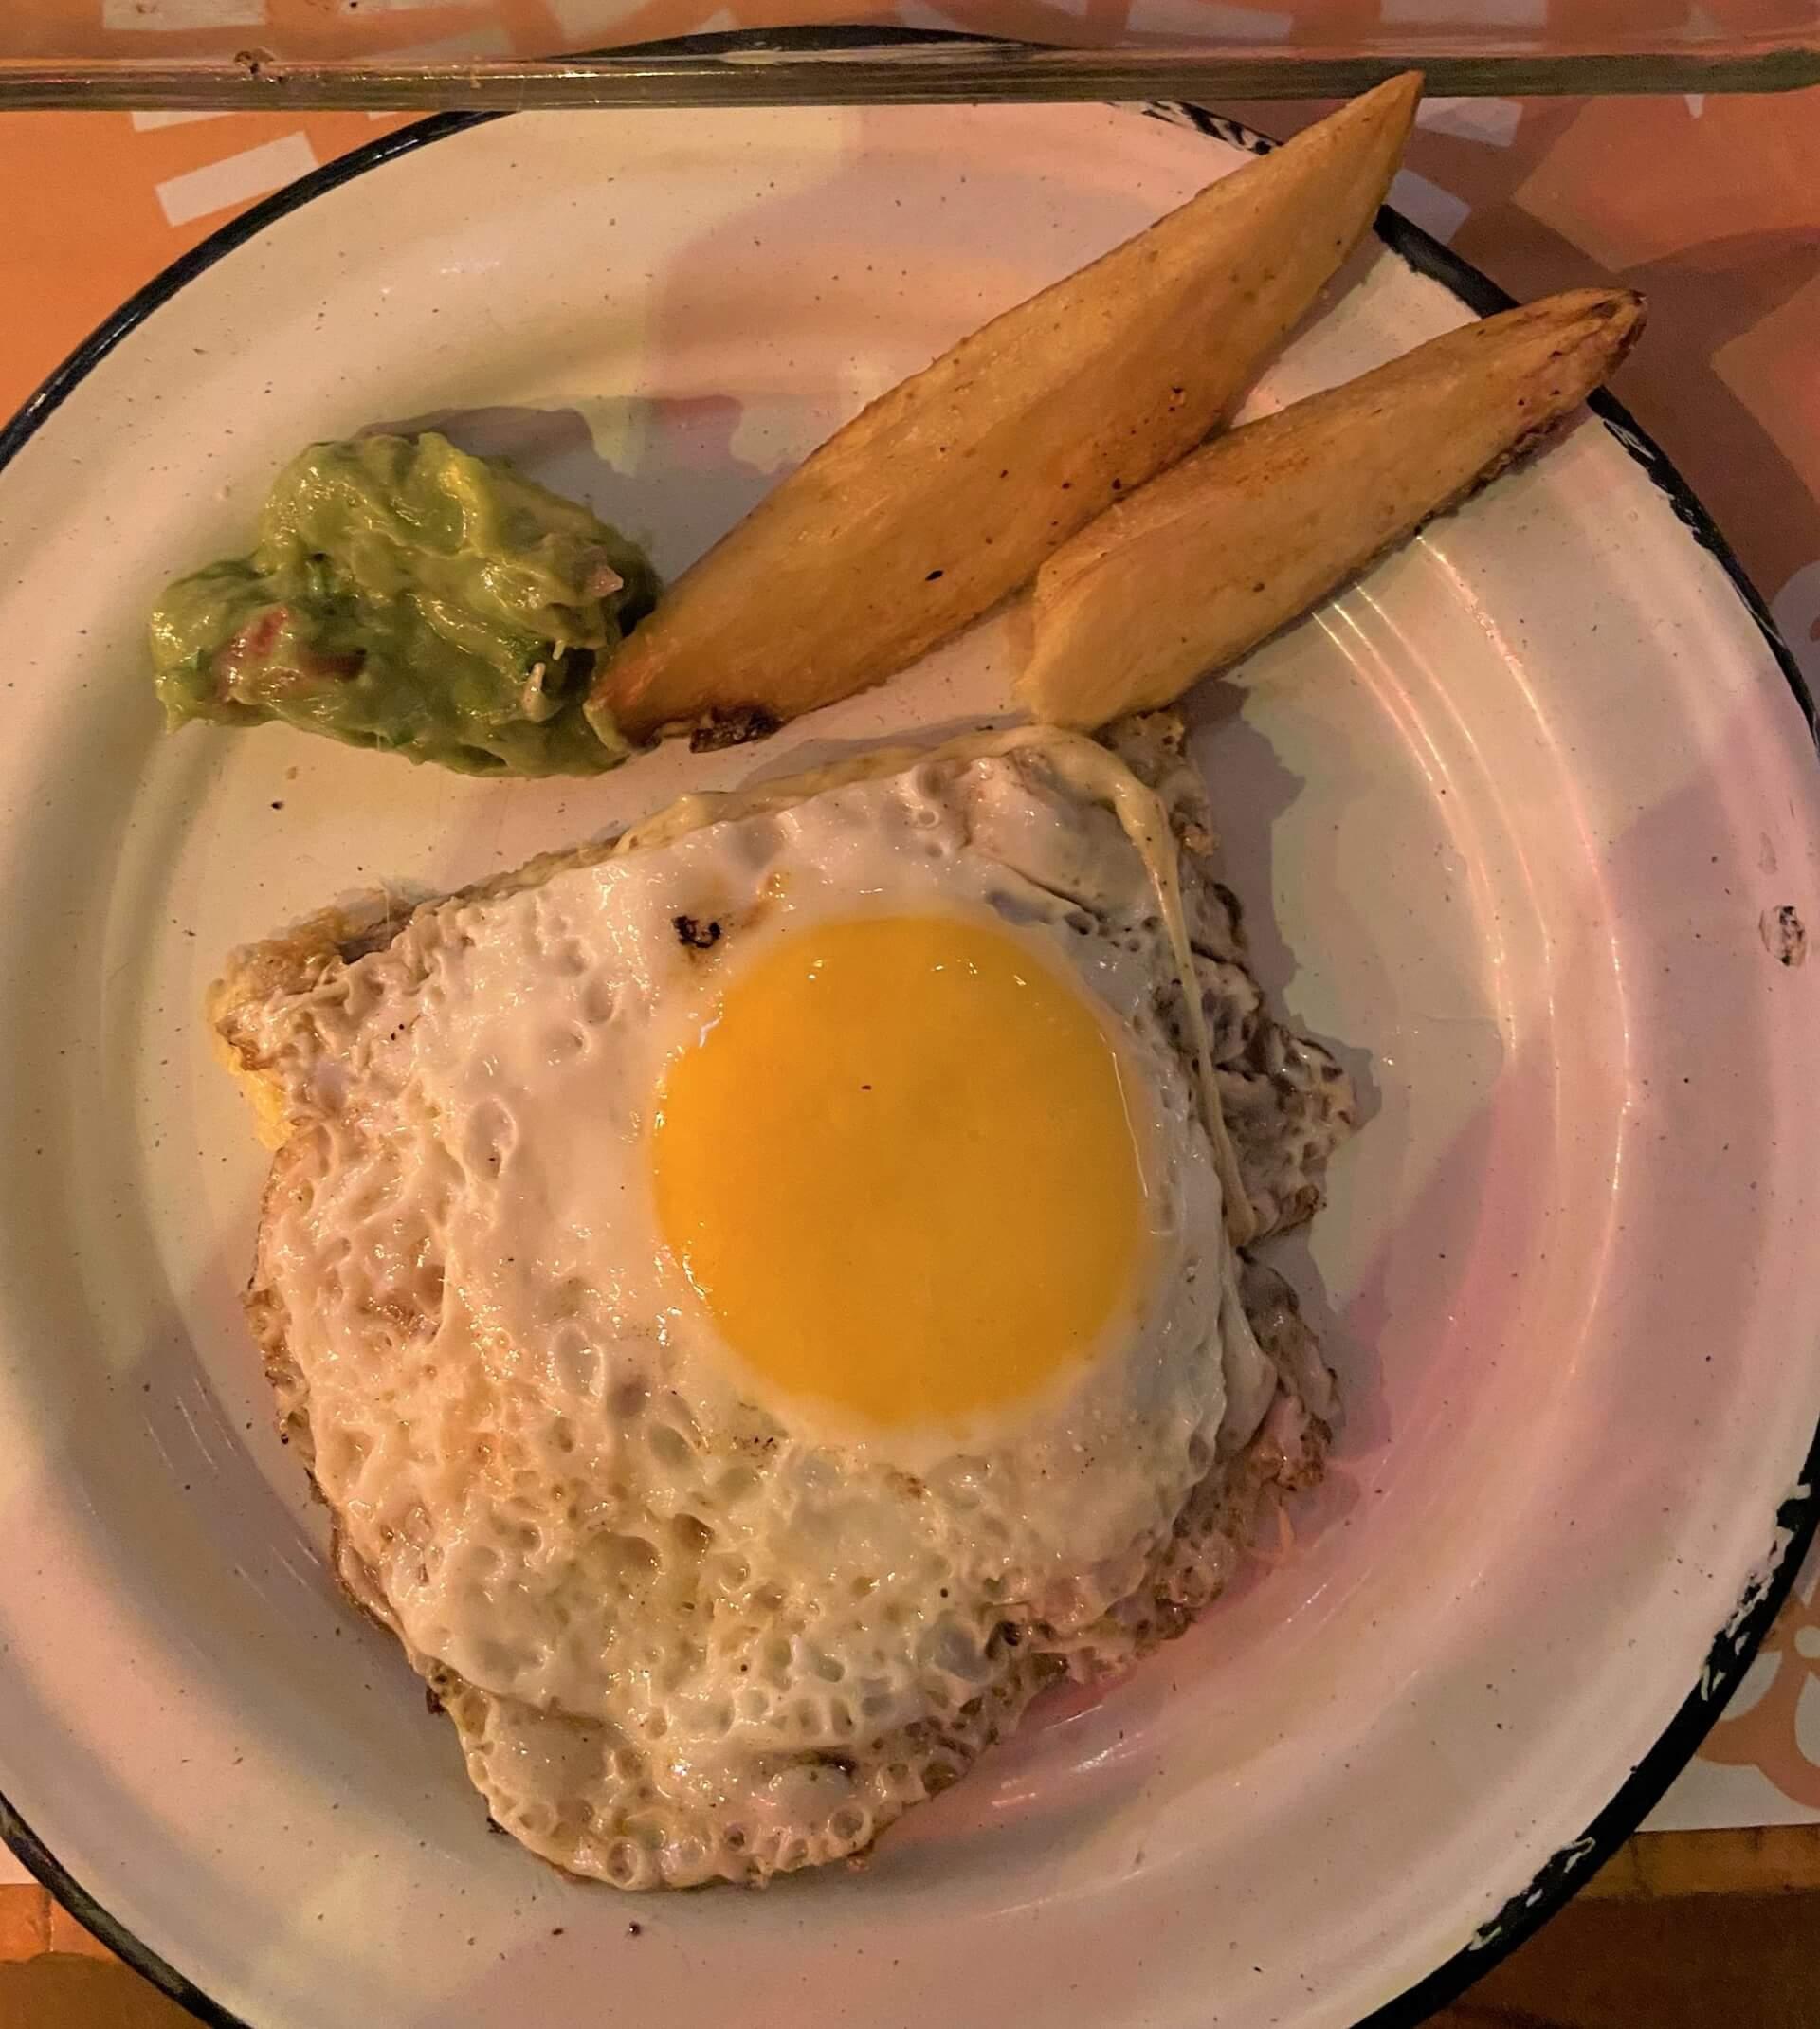 Milanesa com ovo de gema mole, acompanha guacamole, creme azedo (sour cream) e batatas. Foto: Fabíola Cordeiro.